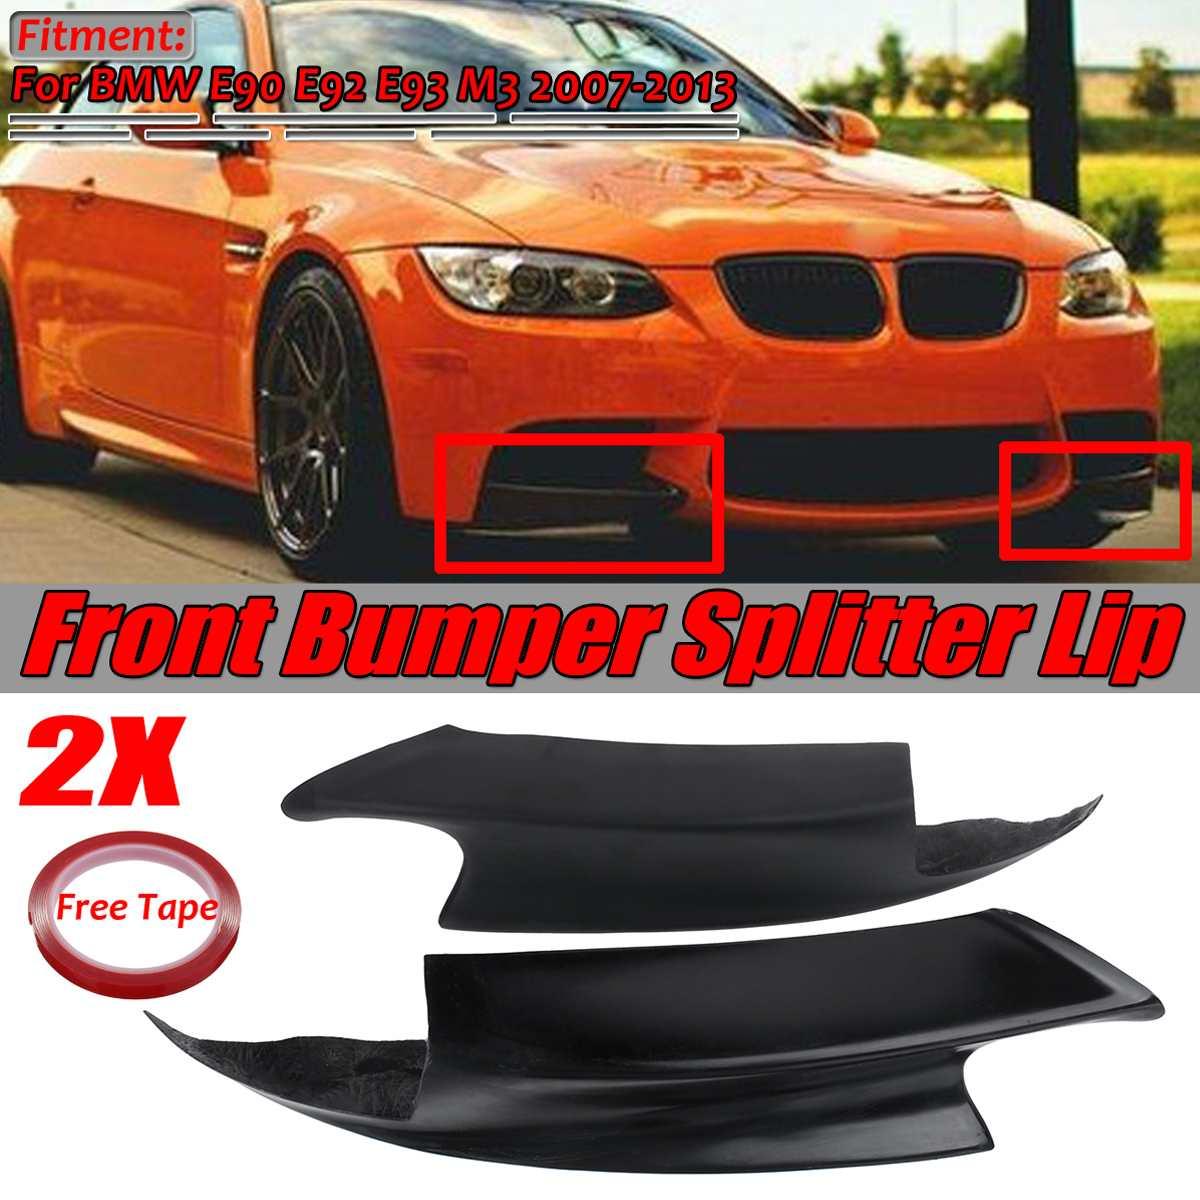 1 пара E90 E92 бампер для губ E92 E93 передний бампер для автомобиля разветвитель спойлер Диффузор Крышка для BMW E90 E92 E93 M3 2007-2013